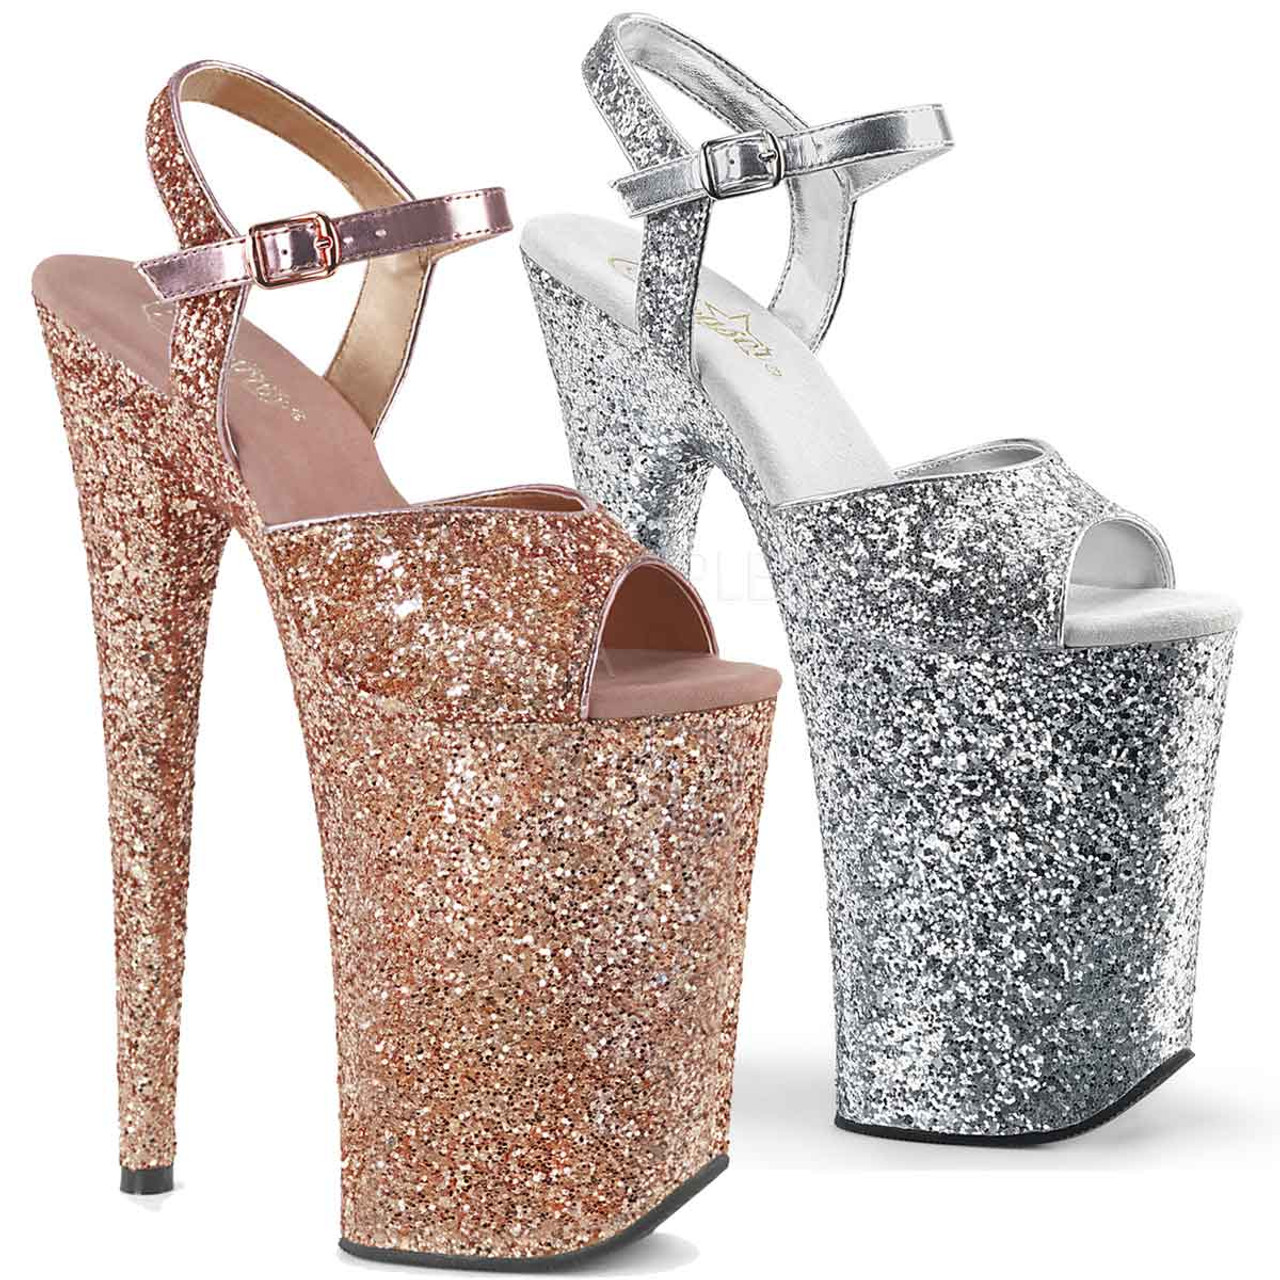 Extrem Plateau Heels INFINITY 930LG Glitter Gold